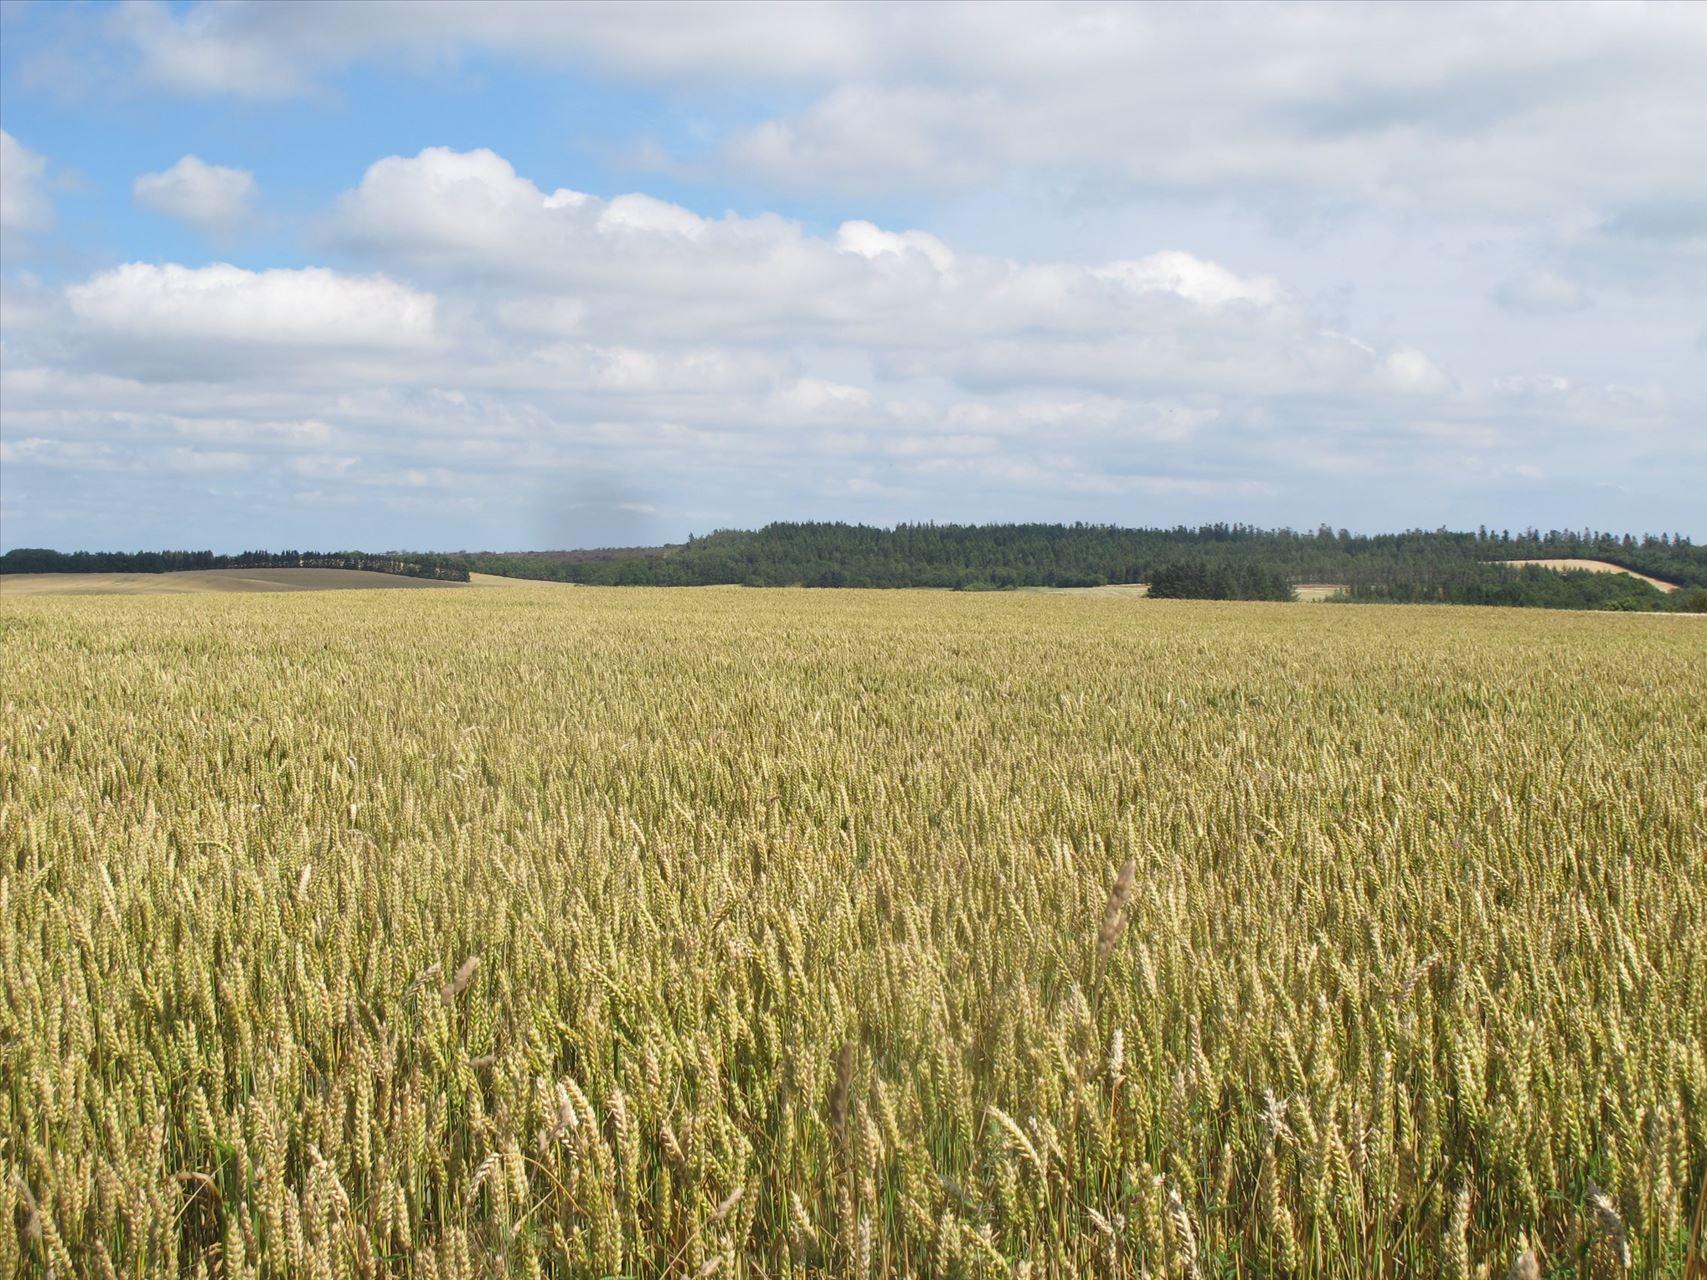 Planteavlsgårde/landbrugsjord til Salg - Vindingvej 2, jord, 6880 Tarm